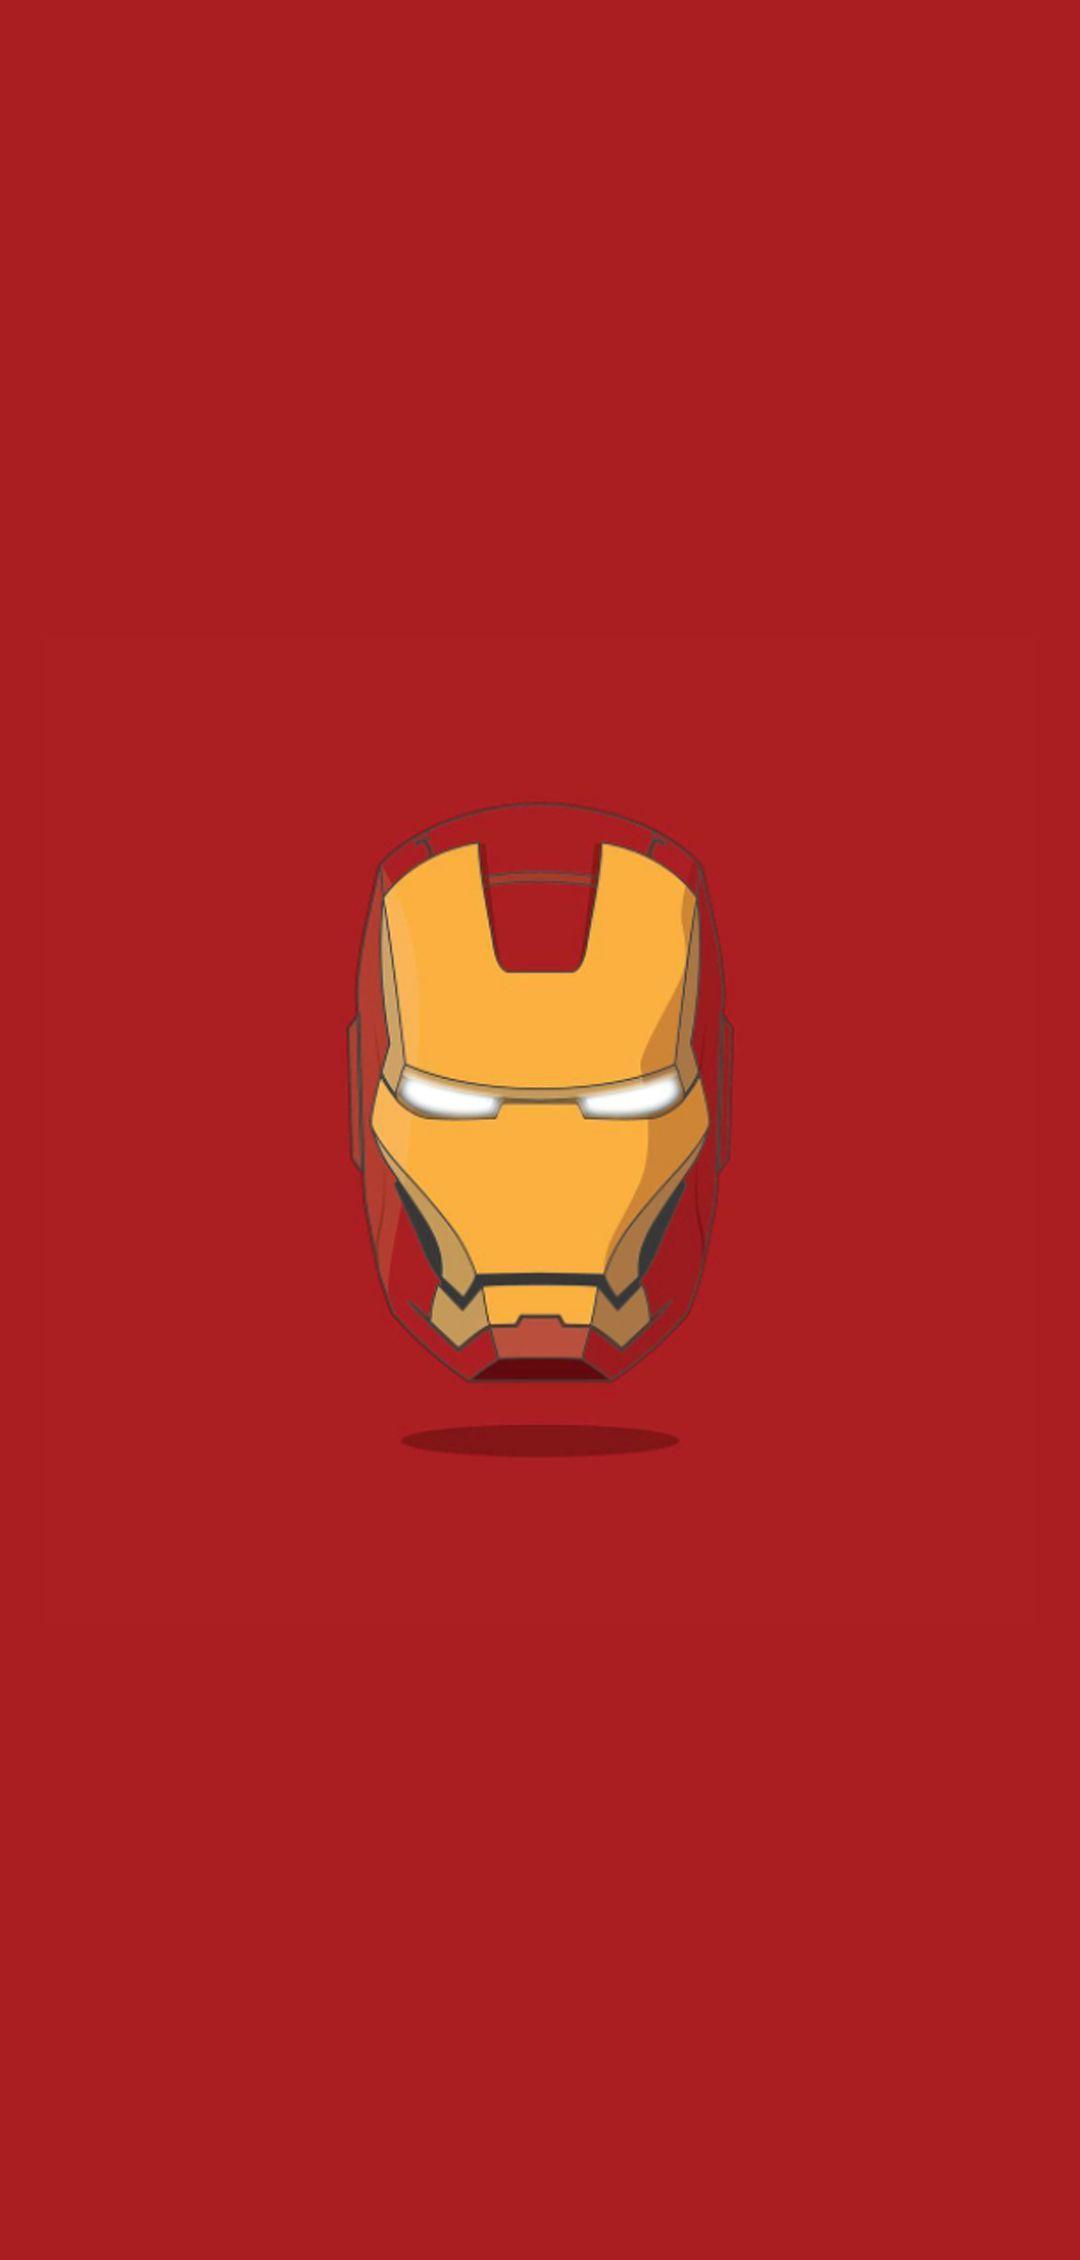 Mobile And Desktop Wallpaper Hd Iron Man Wallpaper Iron Man